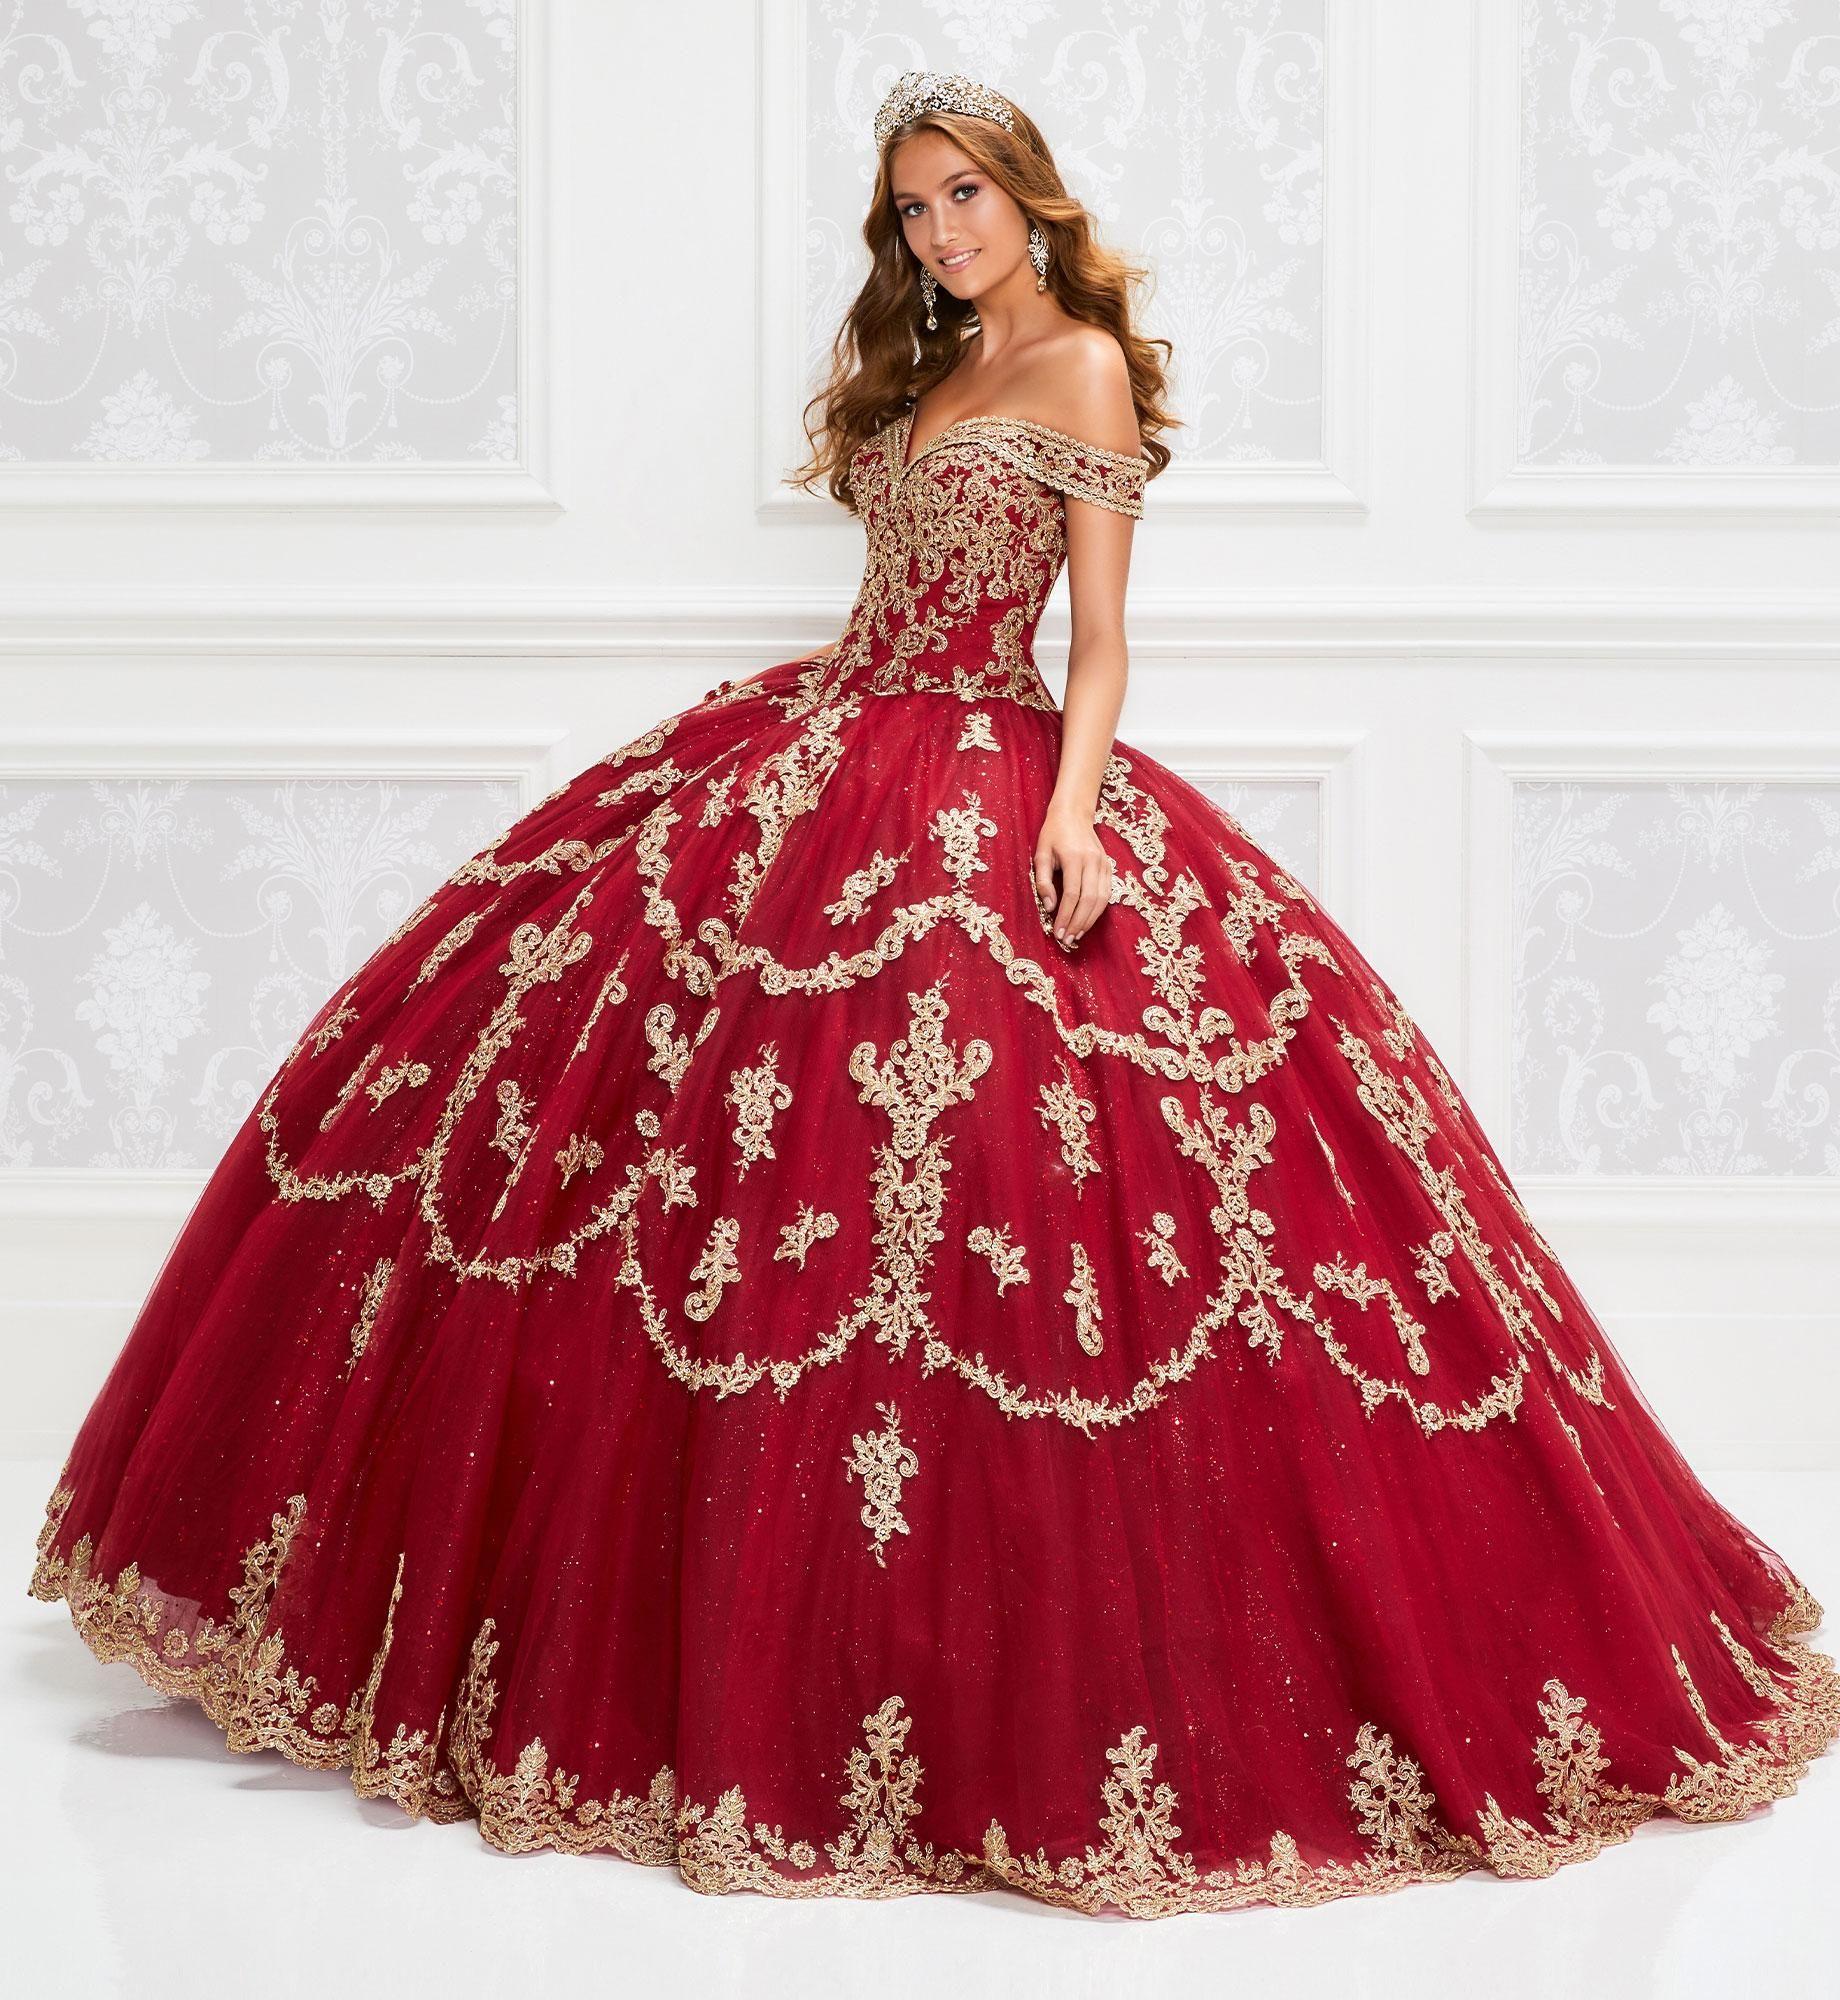 Sparking Red Lace Quinceanera Dresses 2020 Off The Shoulder Gold Applique Ball Gown Floor Length Prom Dress Vestido De Festa Sweet 16 Dress